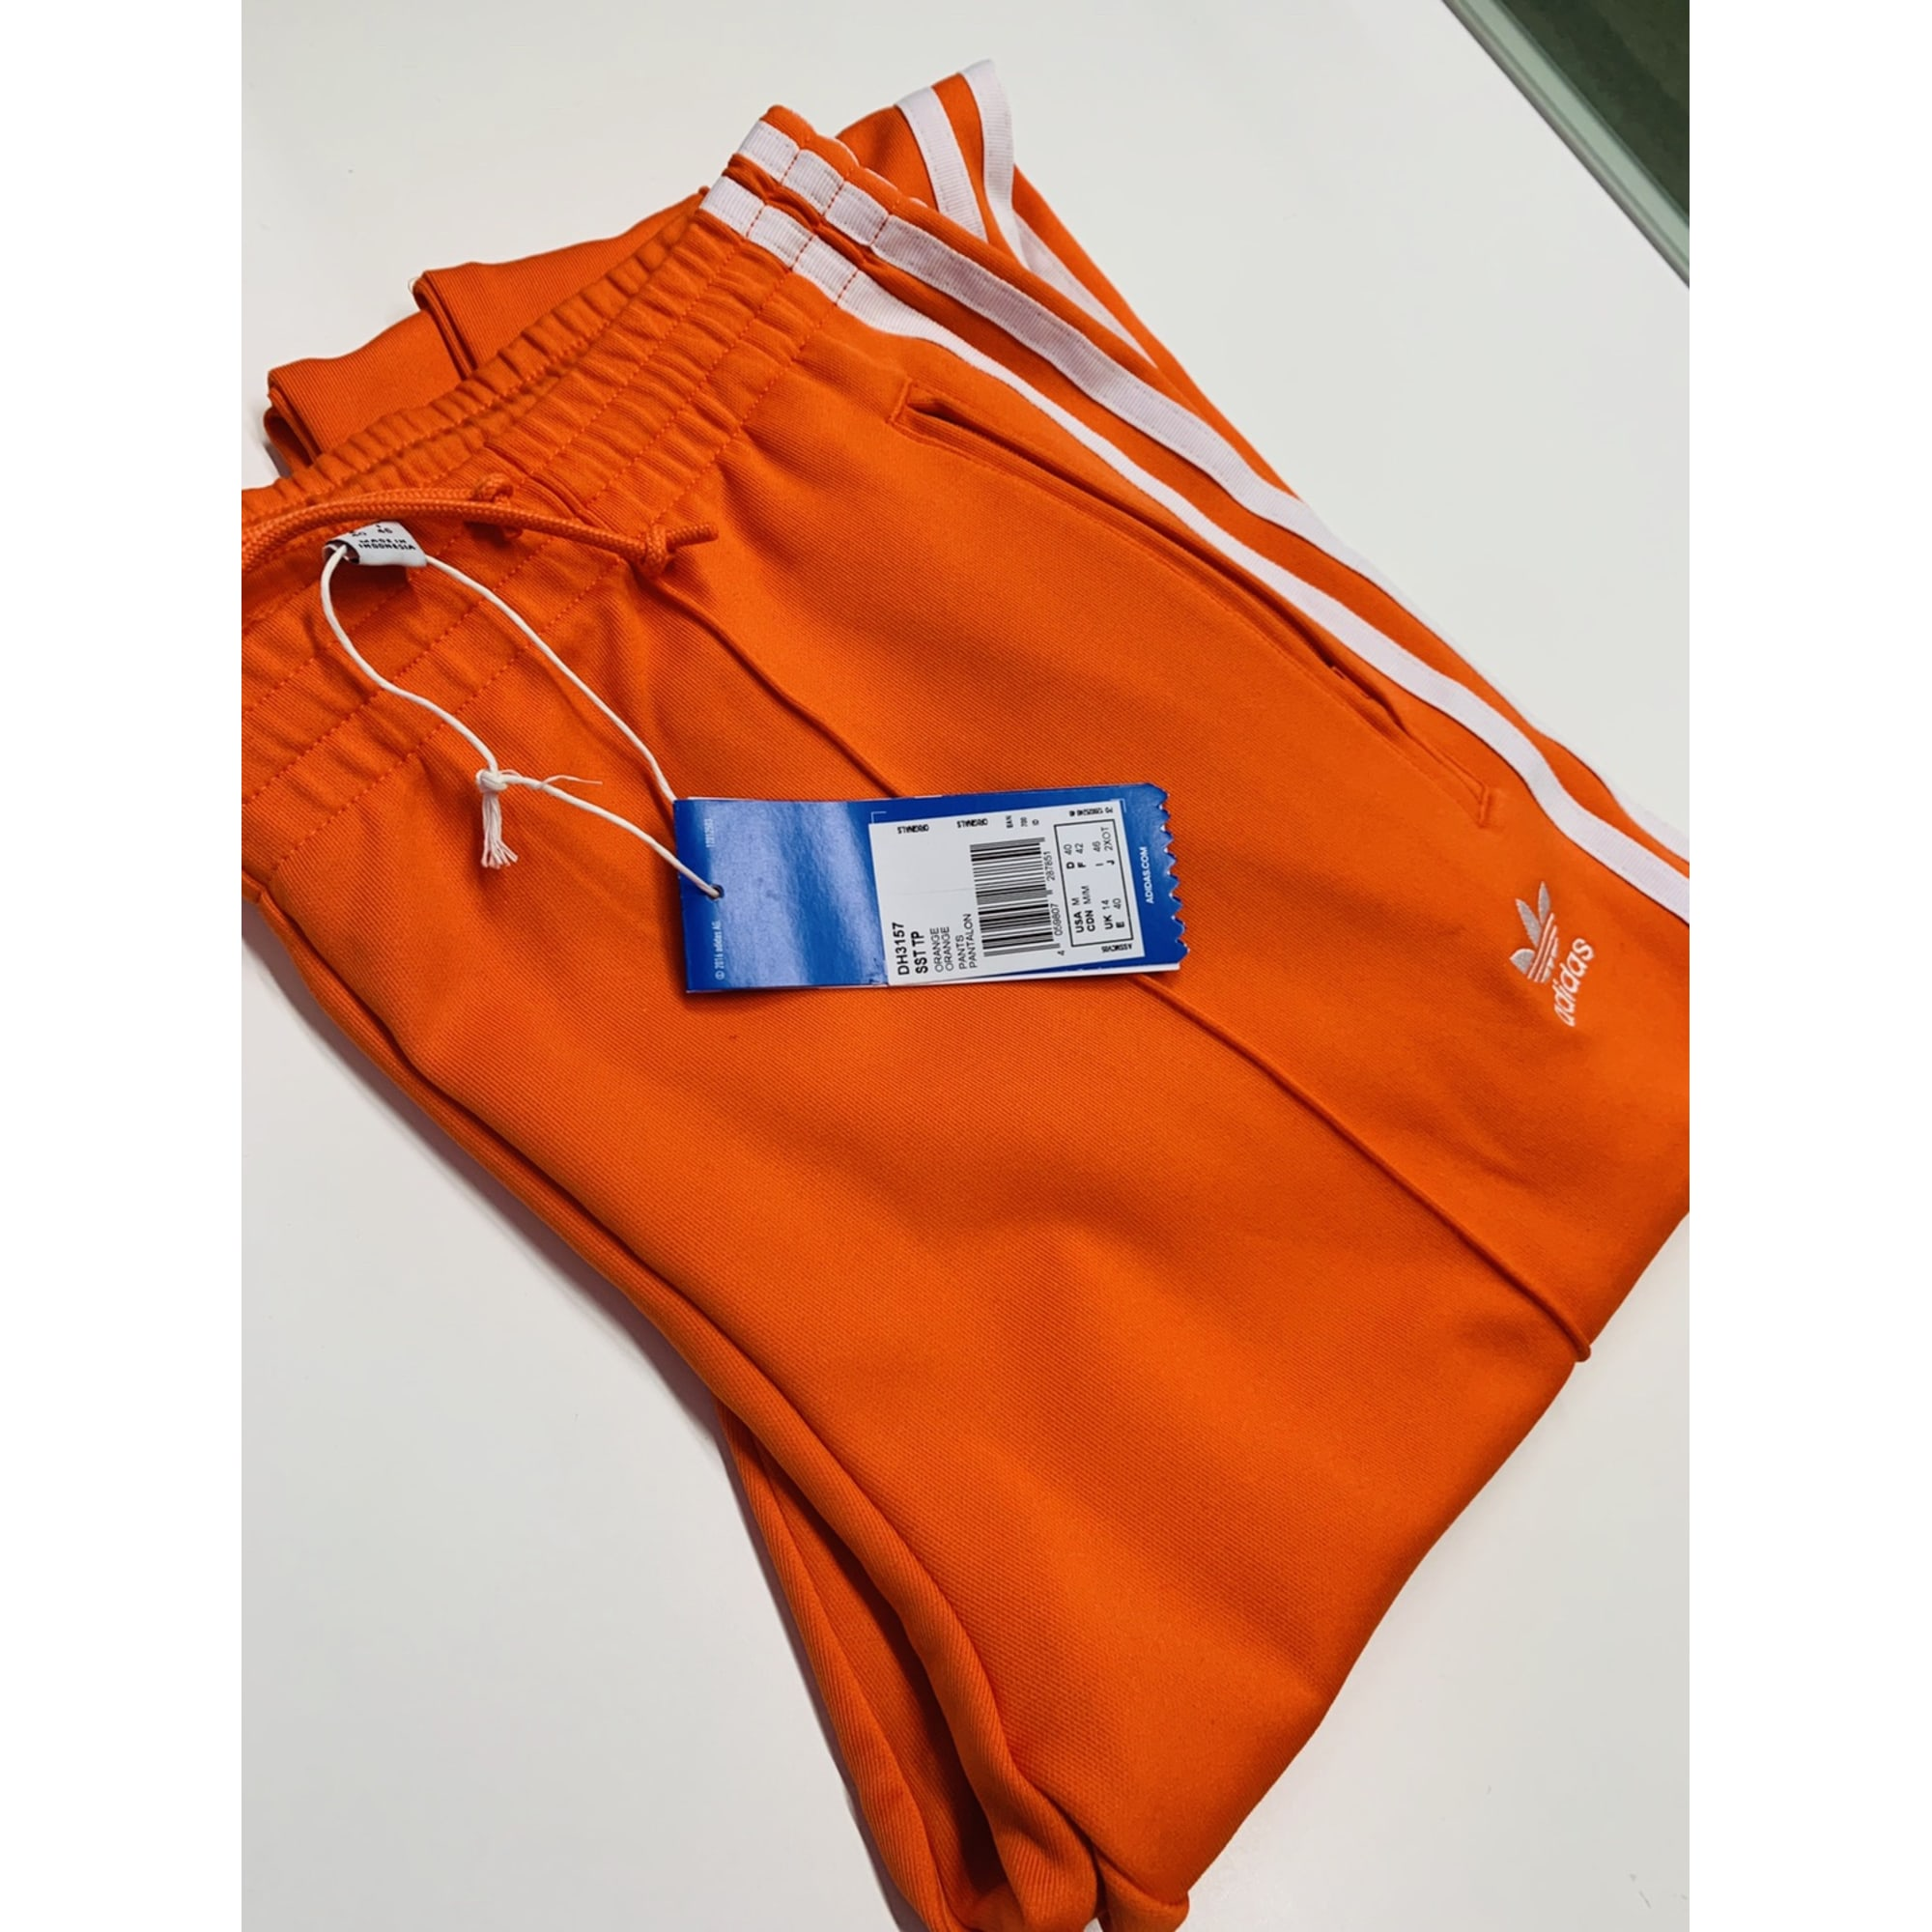 3f06b9dff5 Ensemble jogging ADIDAS 40 (L, T3) orange - 8537976